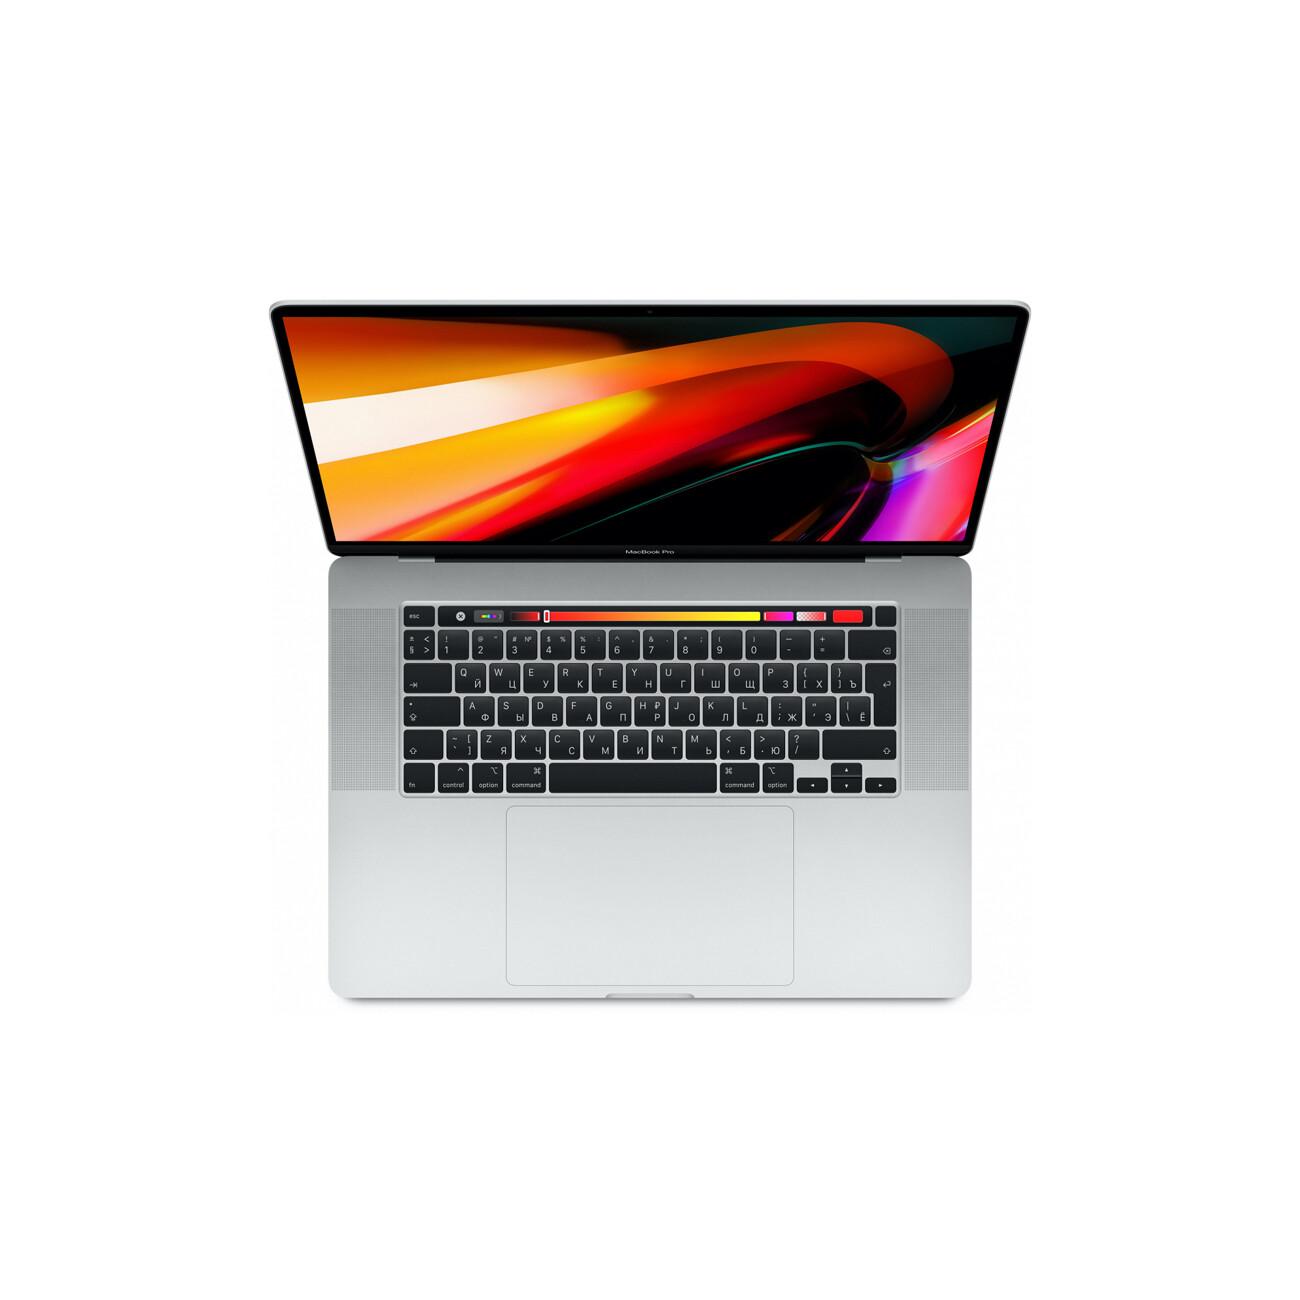 "Apple MacBook Pro 16"" 6 Core i7 2,6 ГГц, 16 ГБ, 512 ГБ SSD, AMD Radeon Pro 5300M, Touch Bar, серебристый"